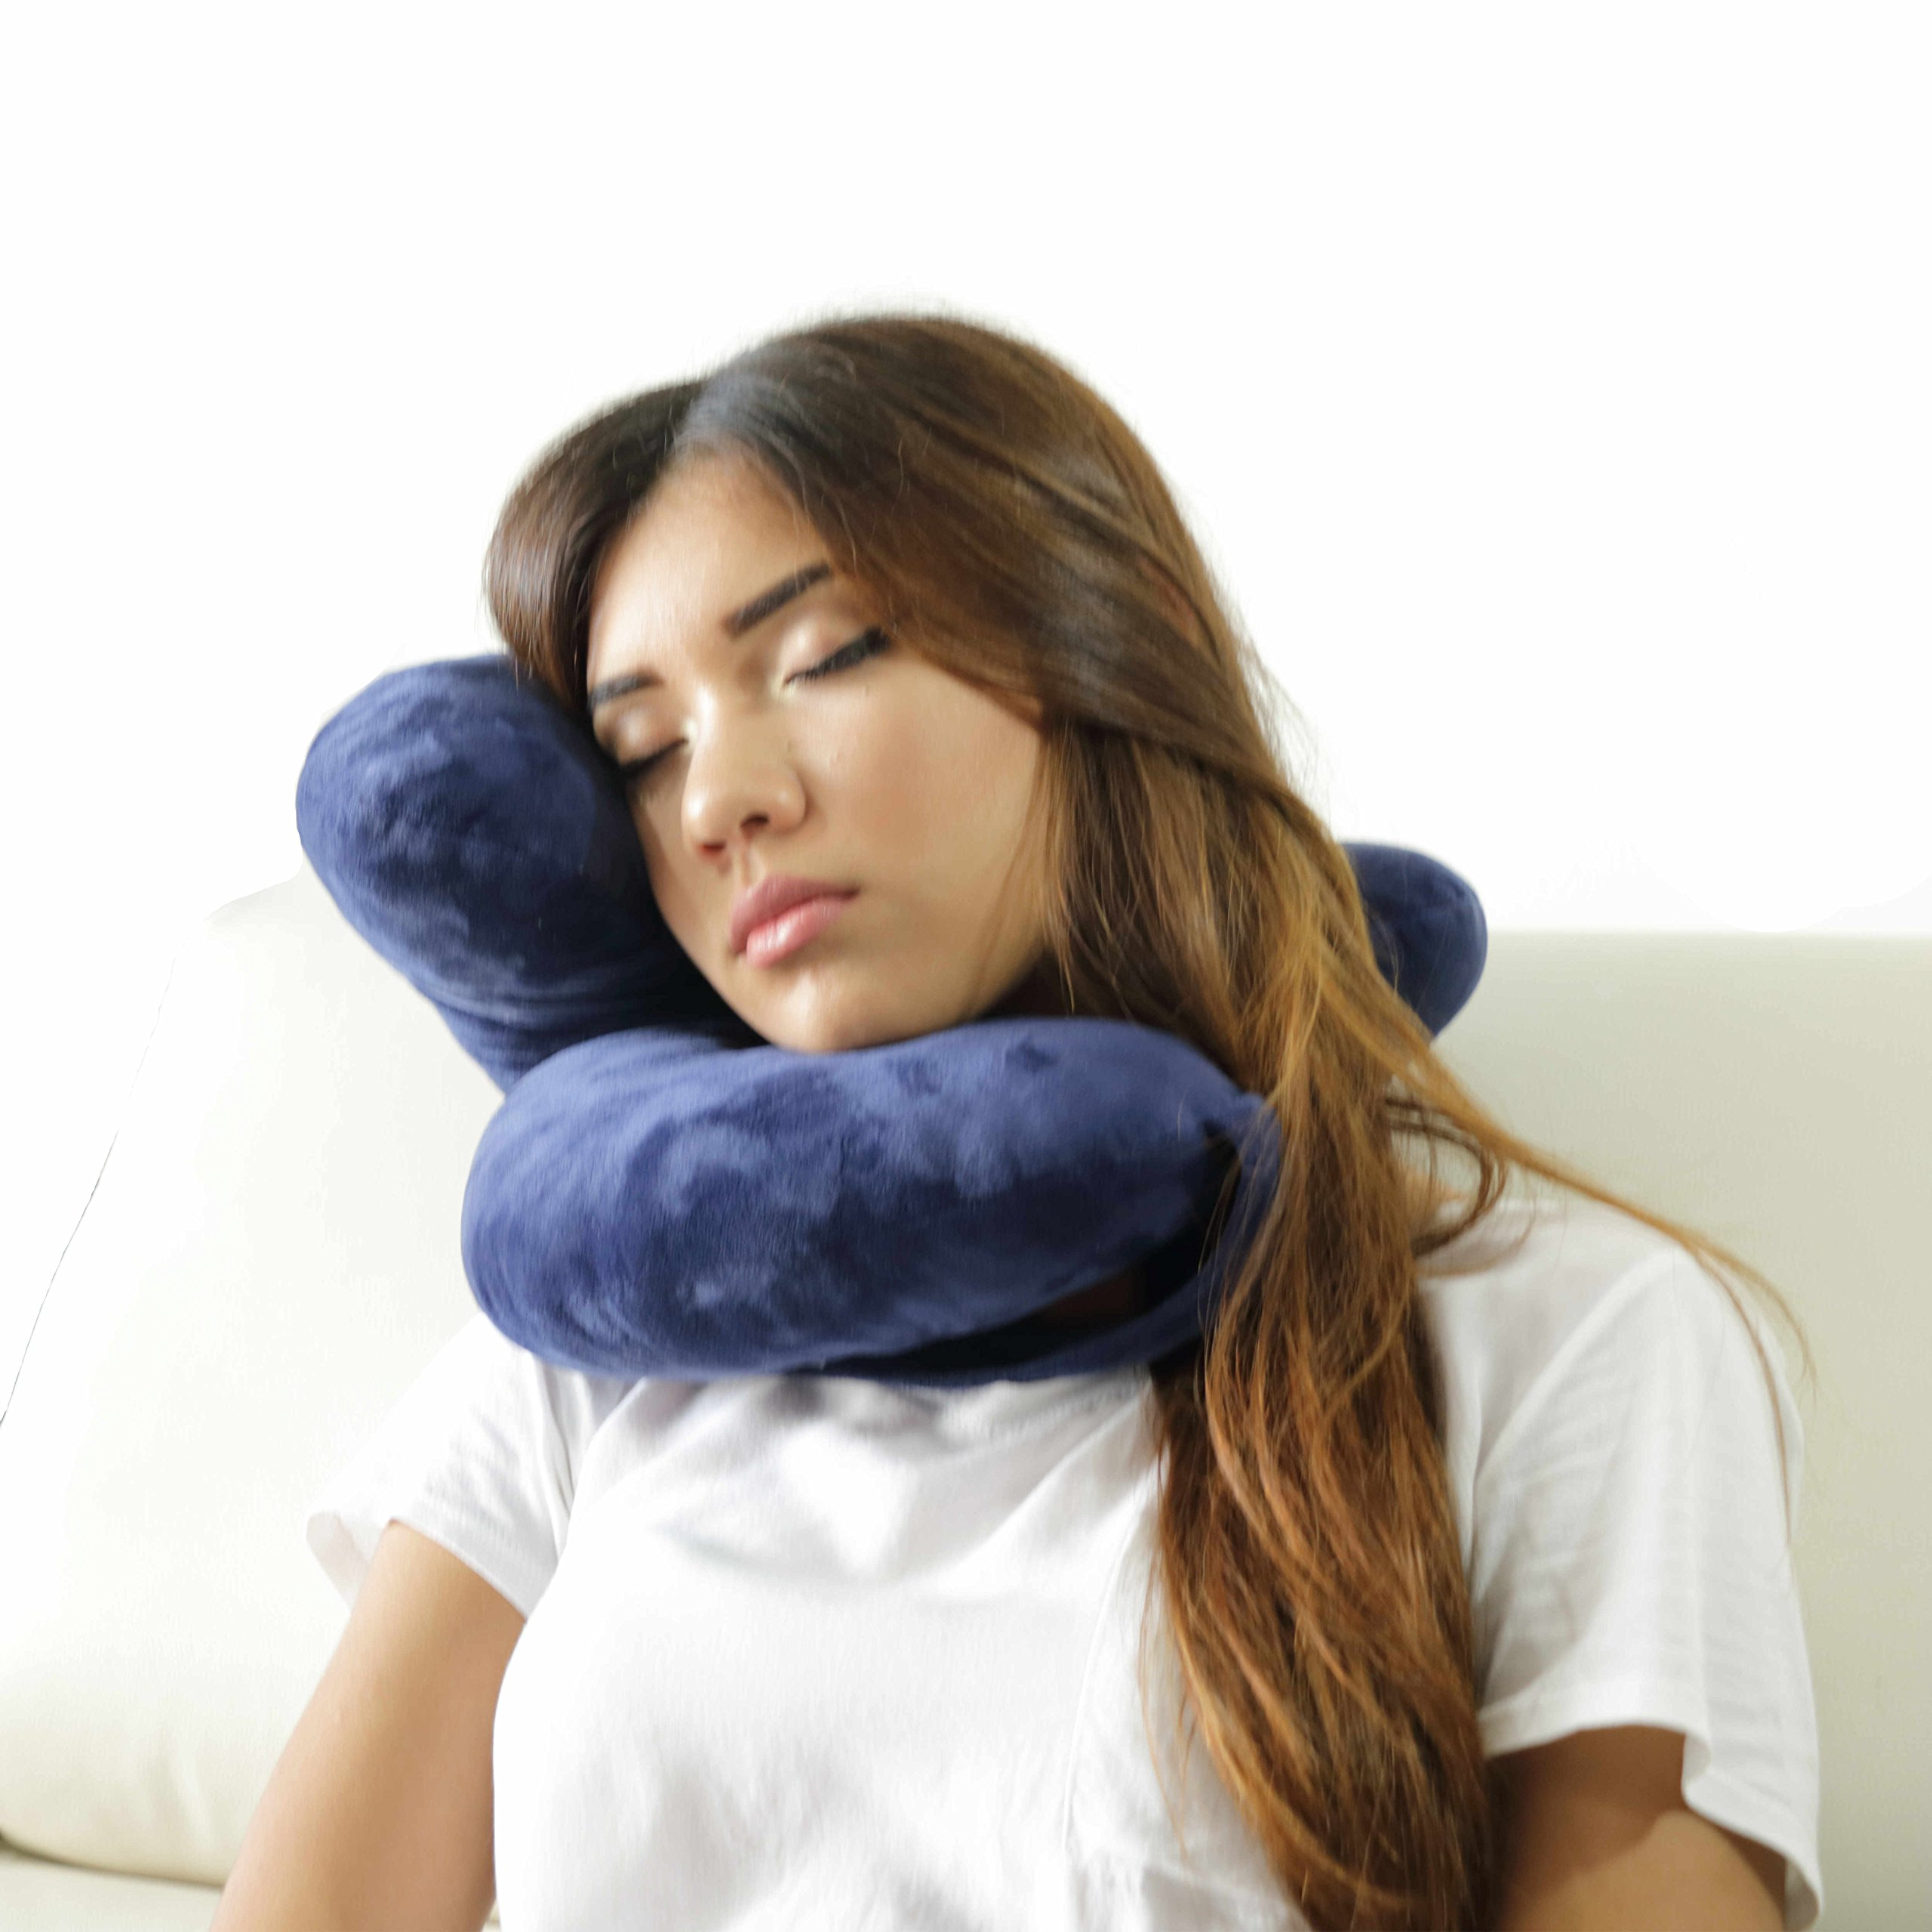 Daisy Travel Pillow Holds Head Like